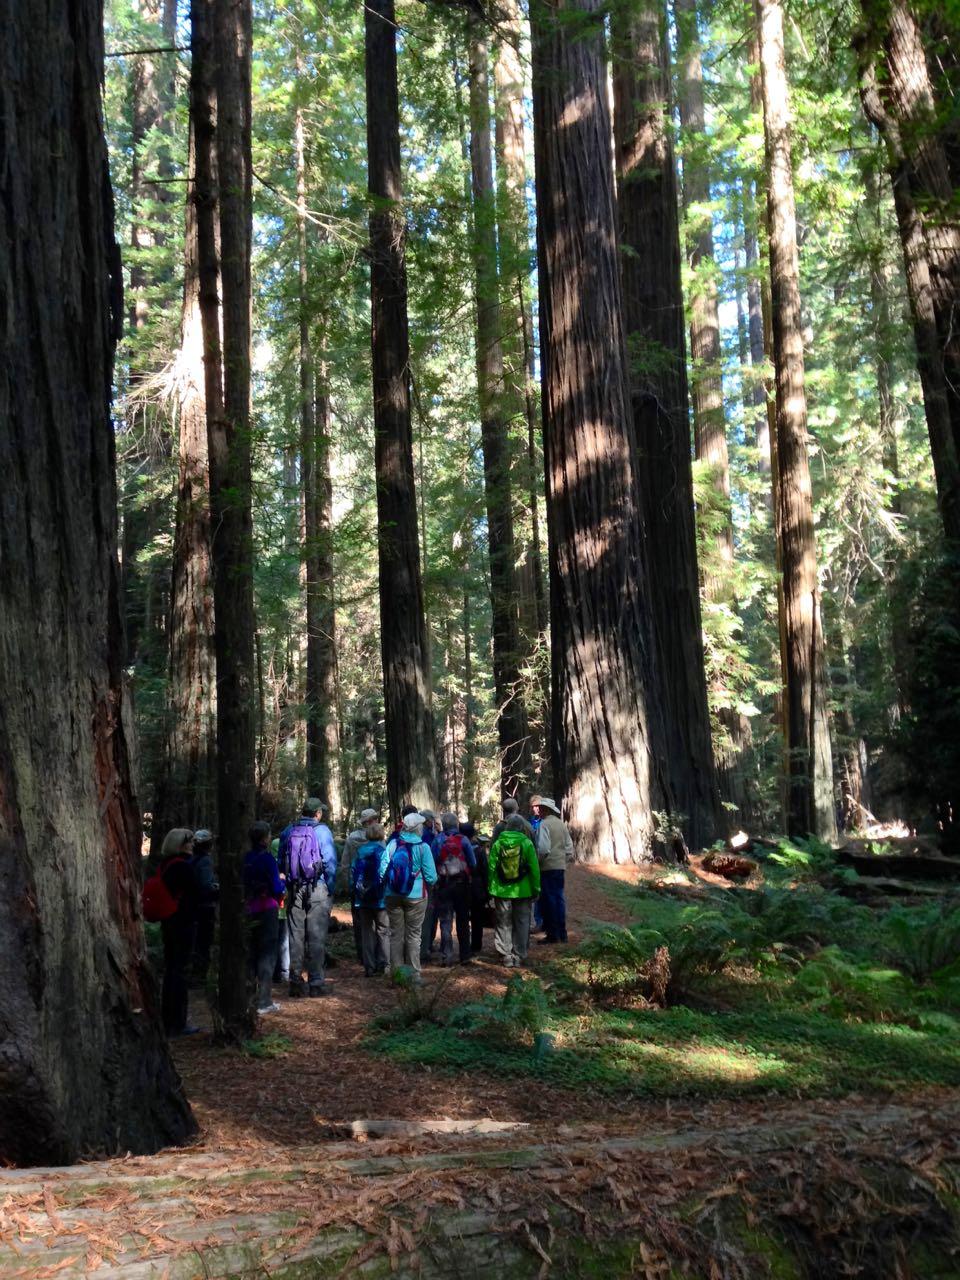 Redwoods 2017 10 01 21 Of 244